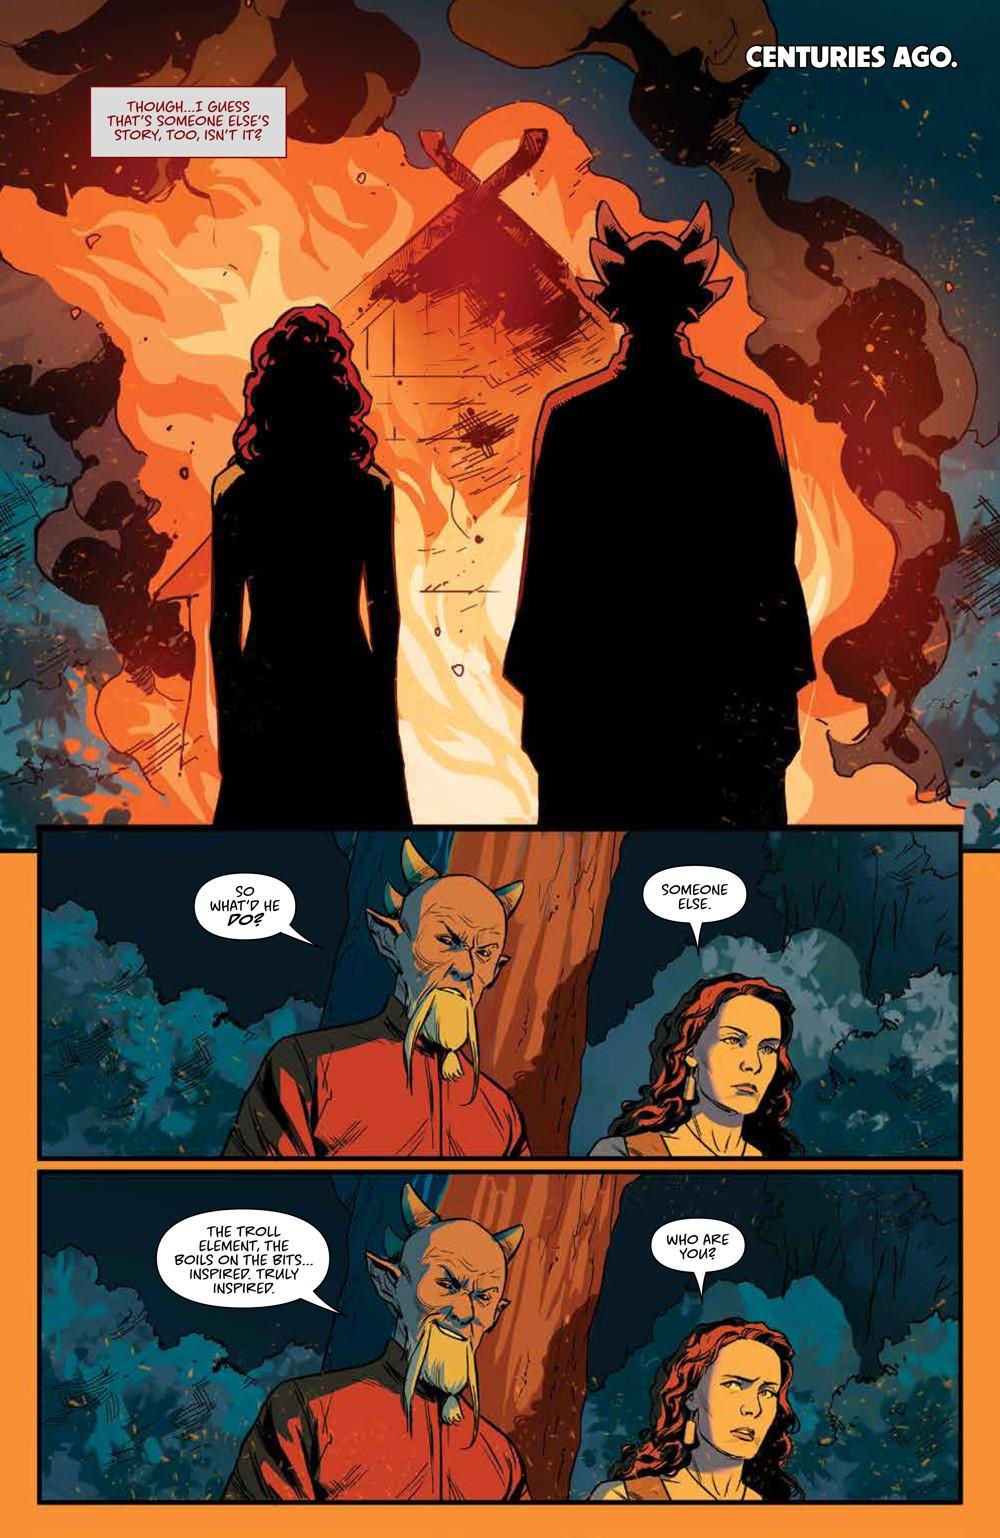 Buffy_v6_SC_PRESS_11 ComicList Previews: BUFFY THE VAMPIRE SLAYER VOLUME 6 SECRETS OF THE SLAYER TP